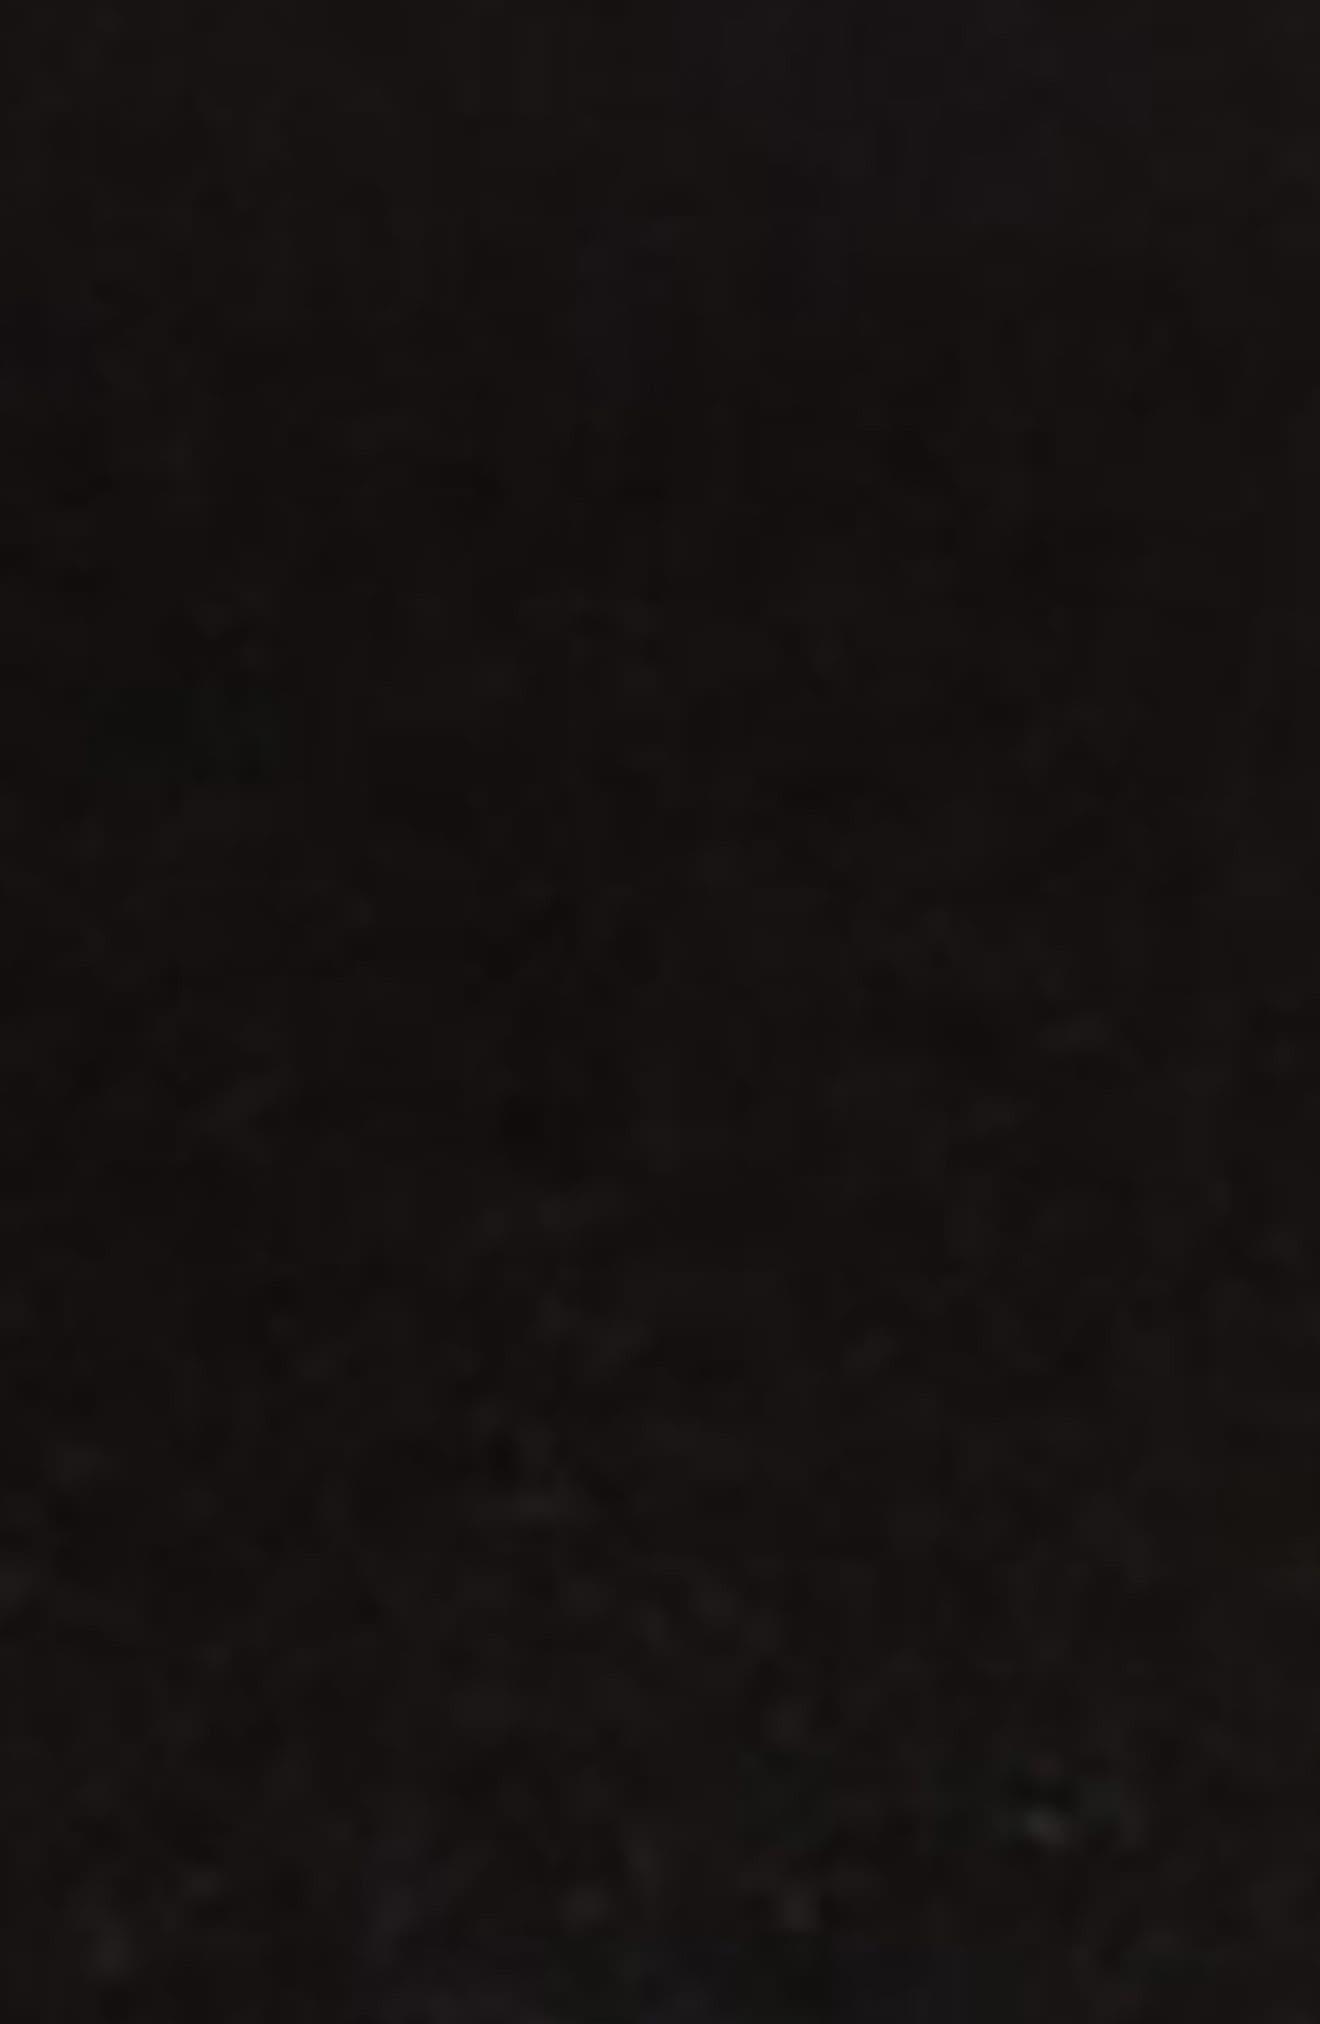 Tailored Trouser Leather Belt,                             Alternate thumbnail 3, color,                             BLACK